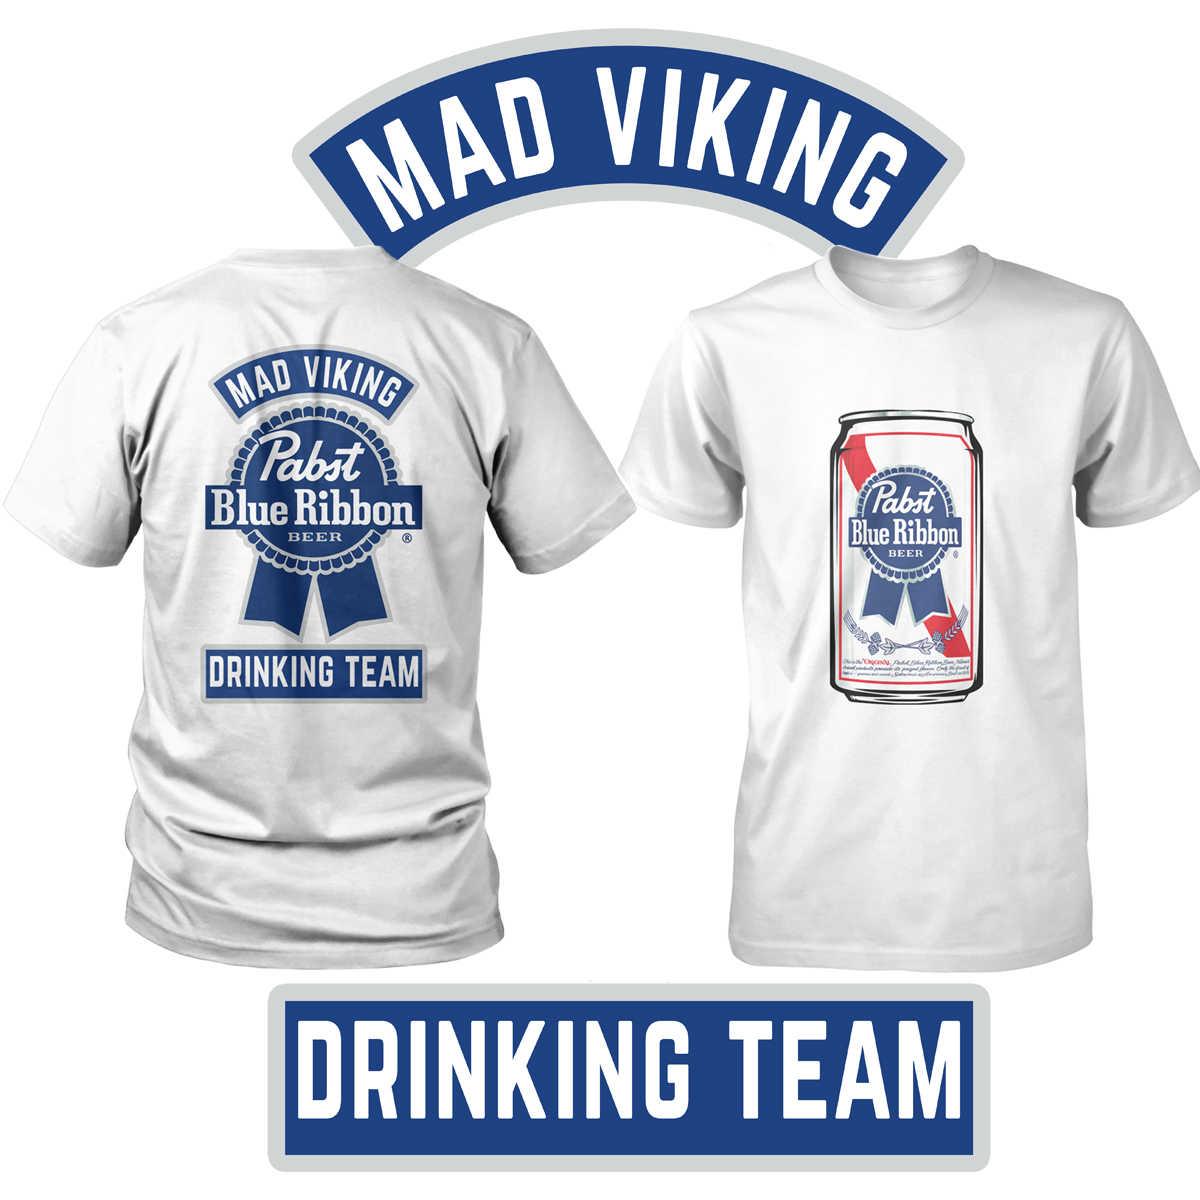 Mad Viking Drinking Team Tee (2nd edition)